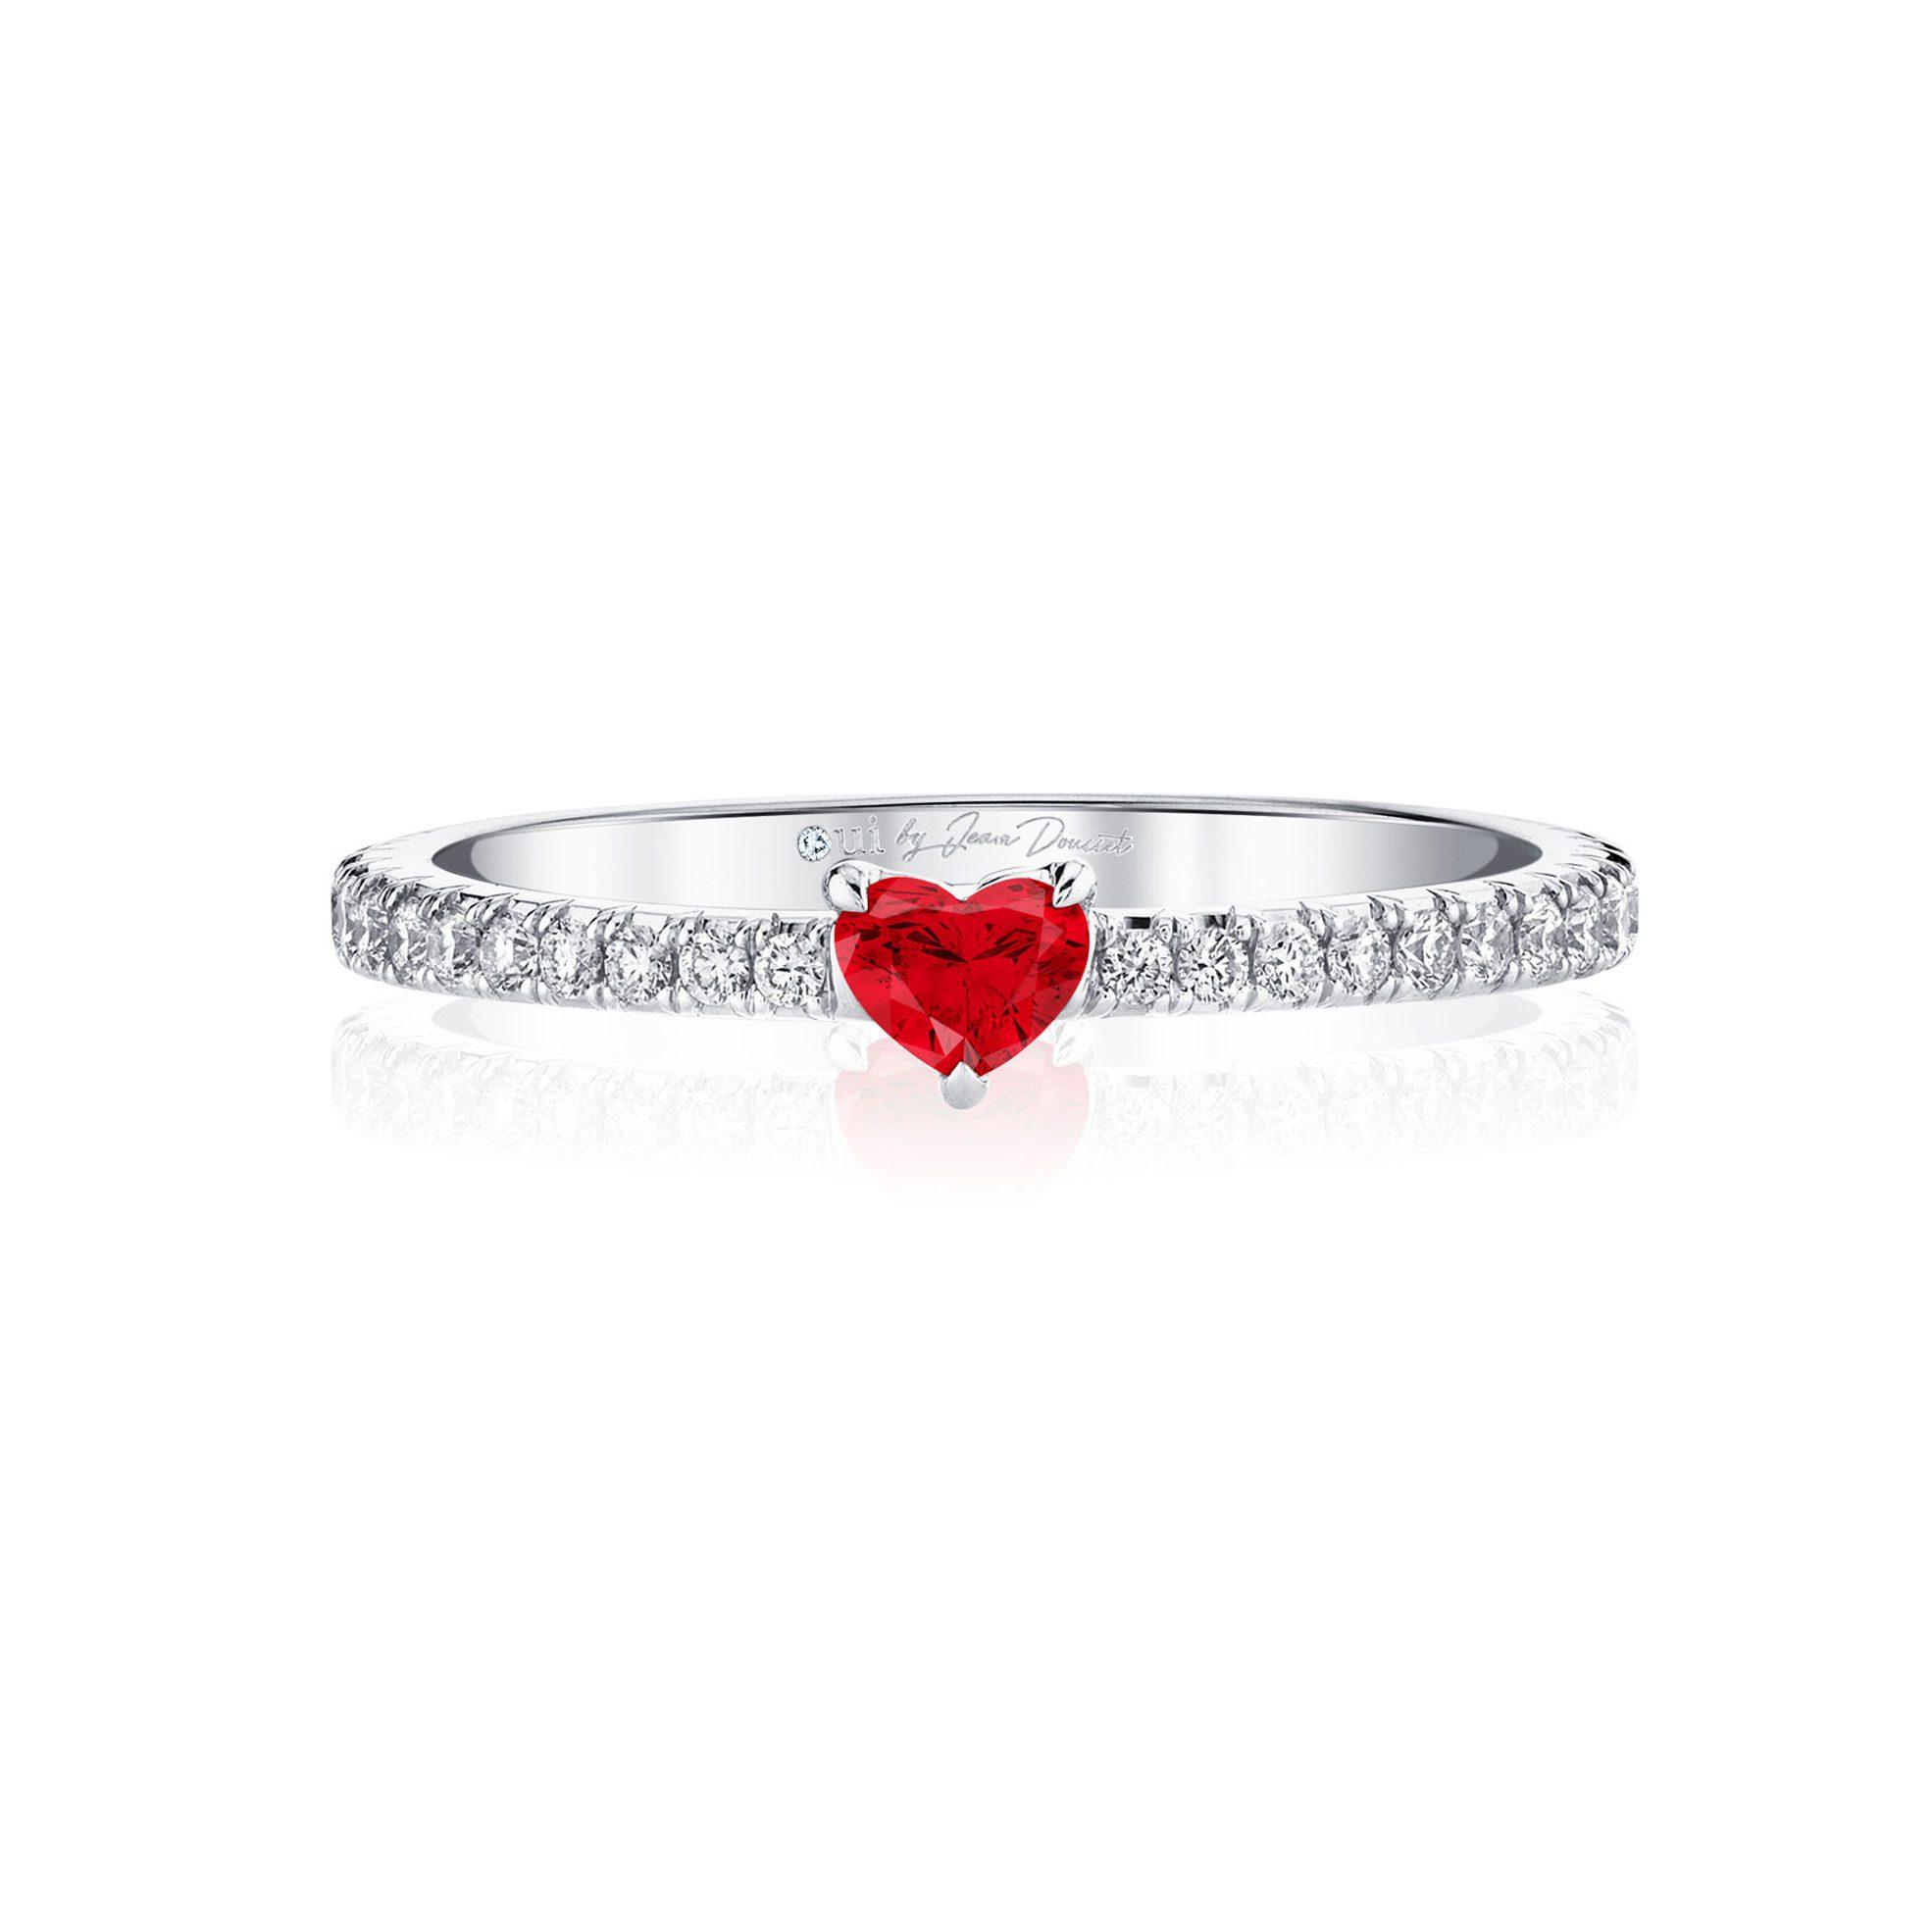 La Petite Heart Ruby Ring diamond pavé band in 18k White Gold Front View by Oui by Jean Dousset